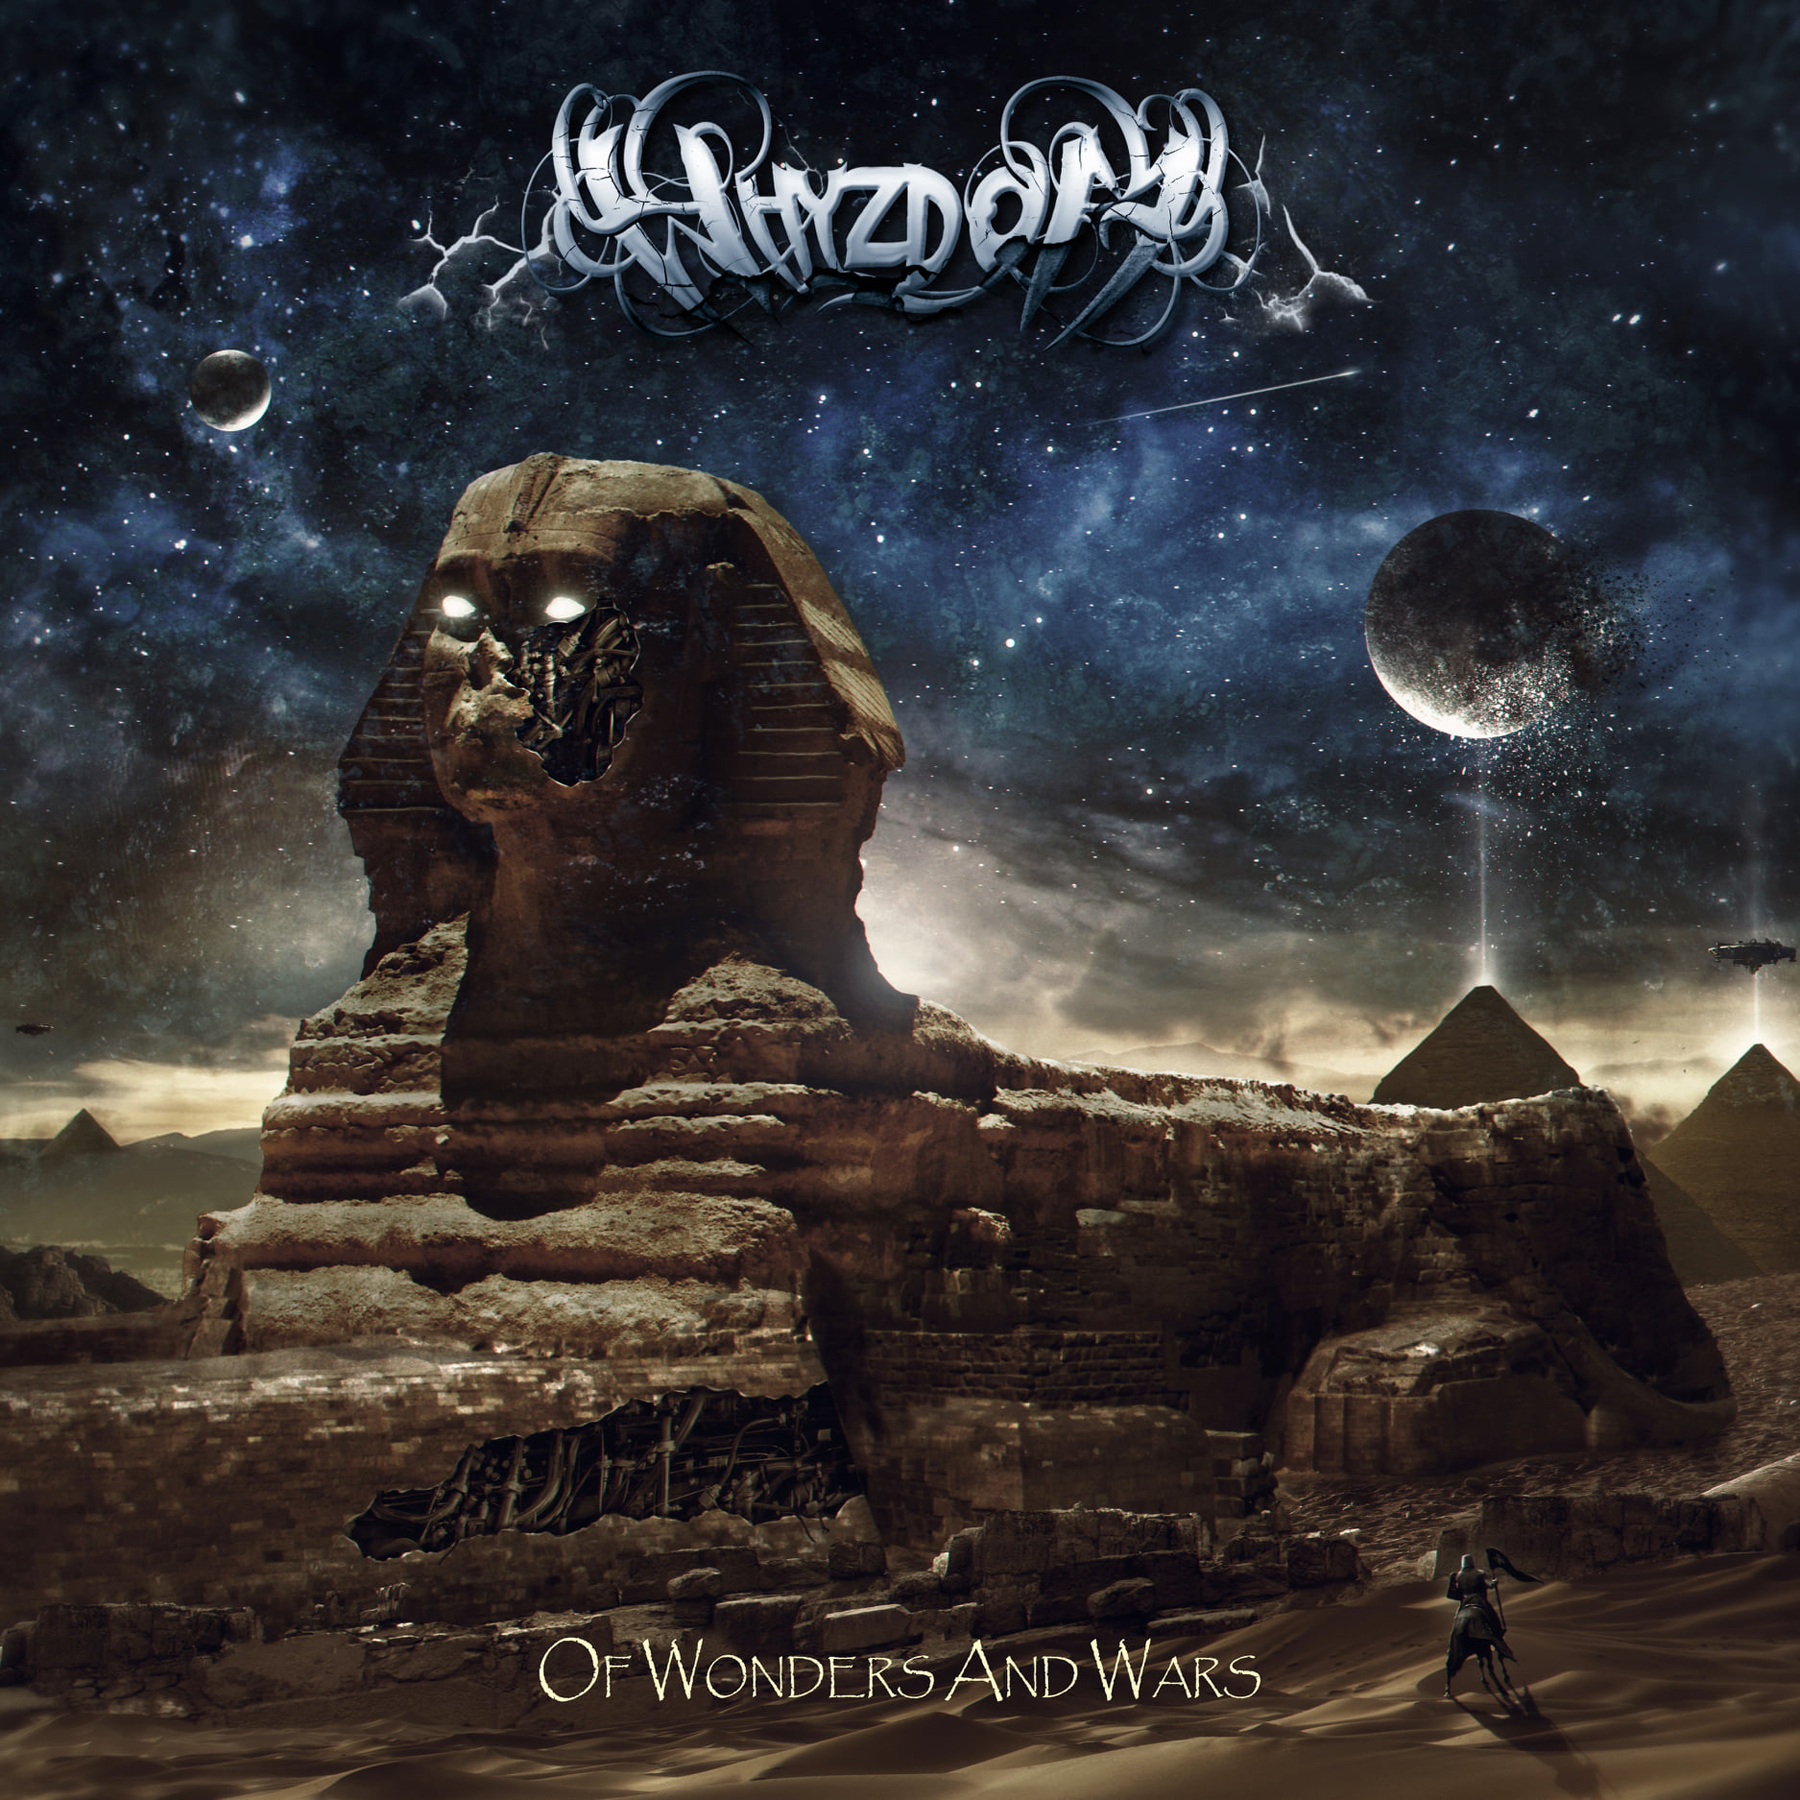 WHYZDOM album